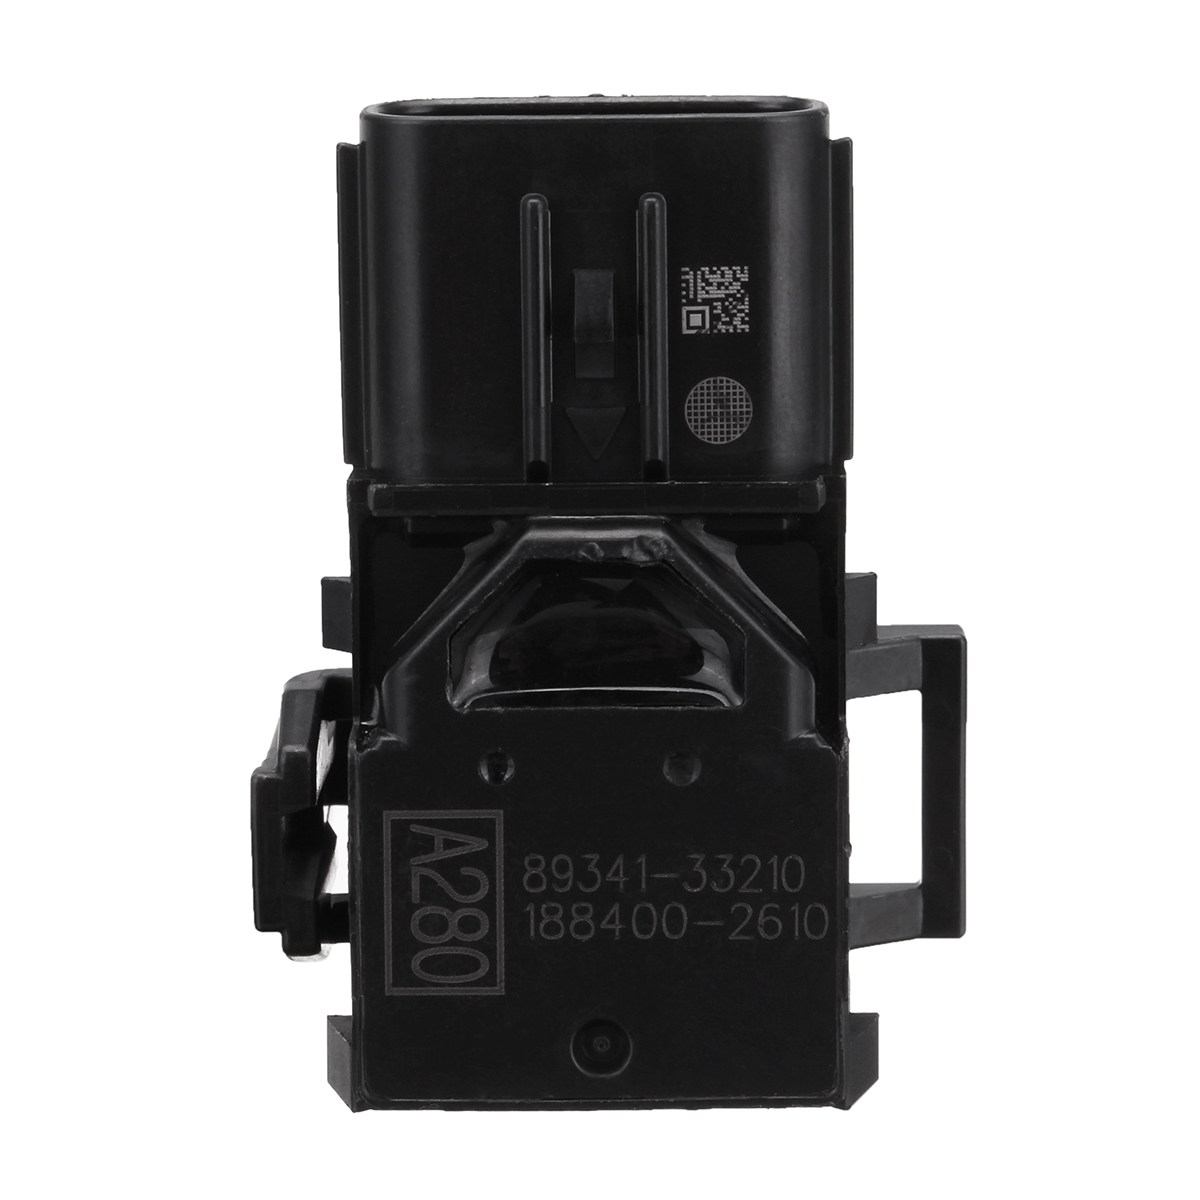 medium resolution of  89341 33210 188400 2610 89341 33210 b6 reverse parking aid sensor radar for lexus rx450h rx350 f sport base 3 5l v6 2013 2014 in parking sensors from